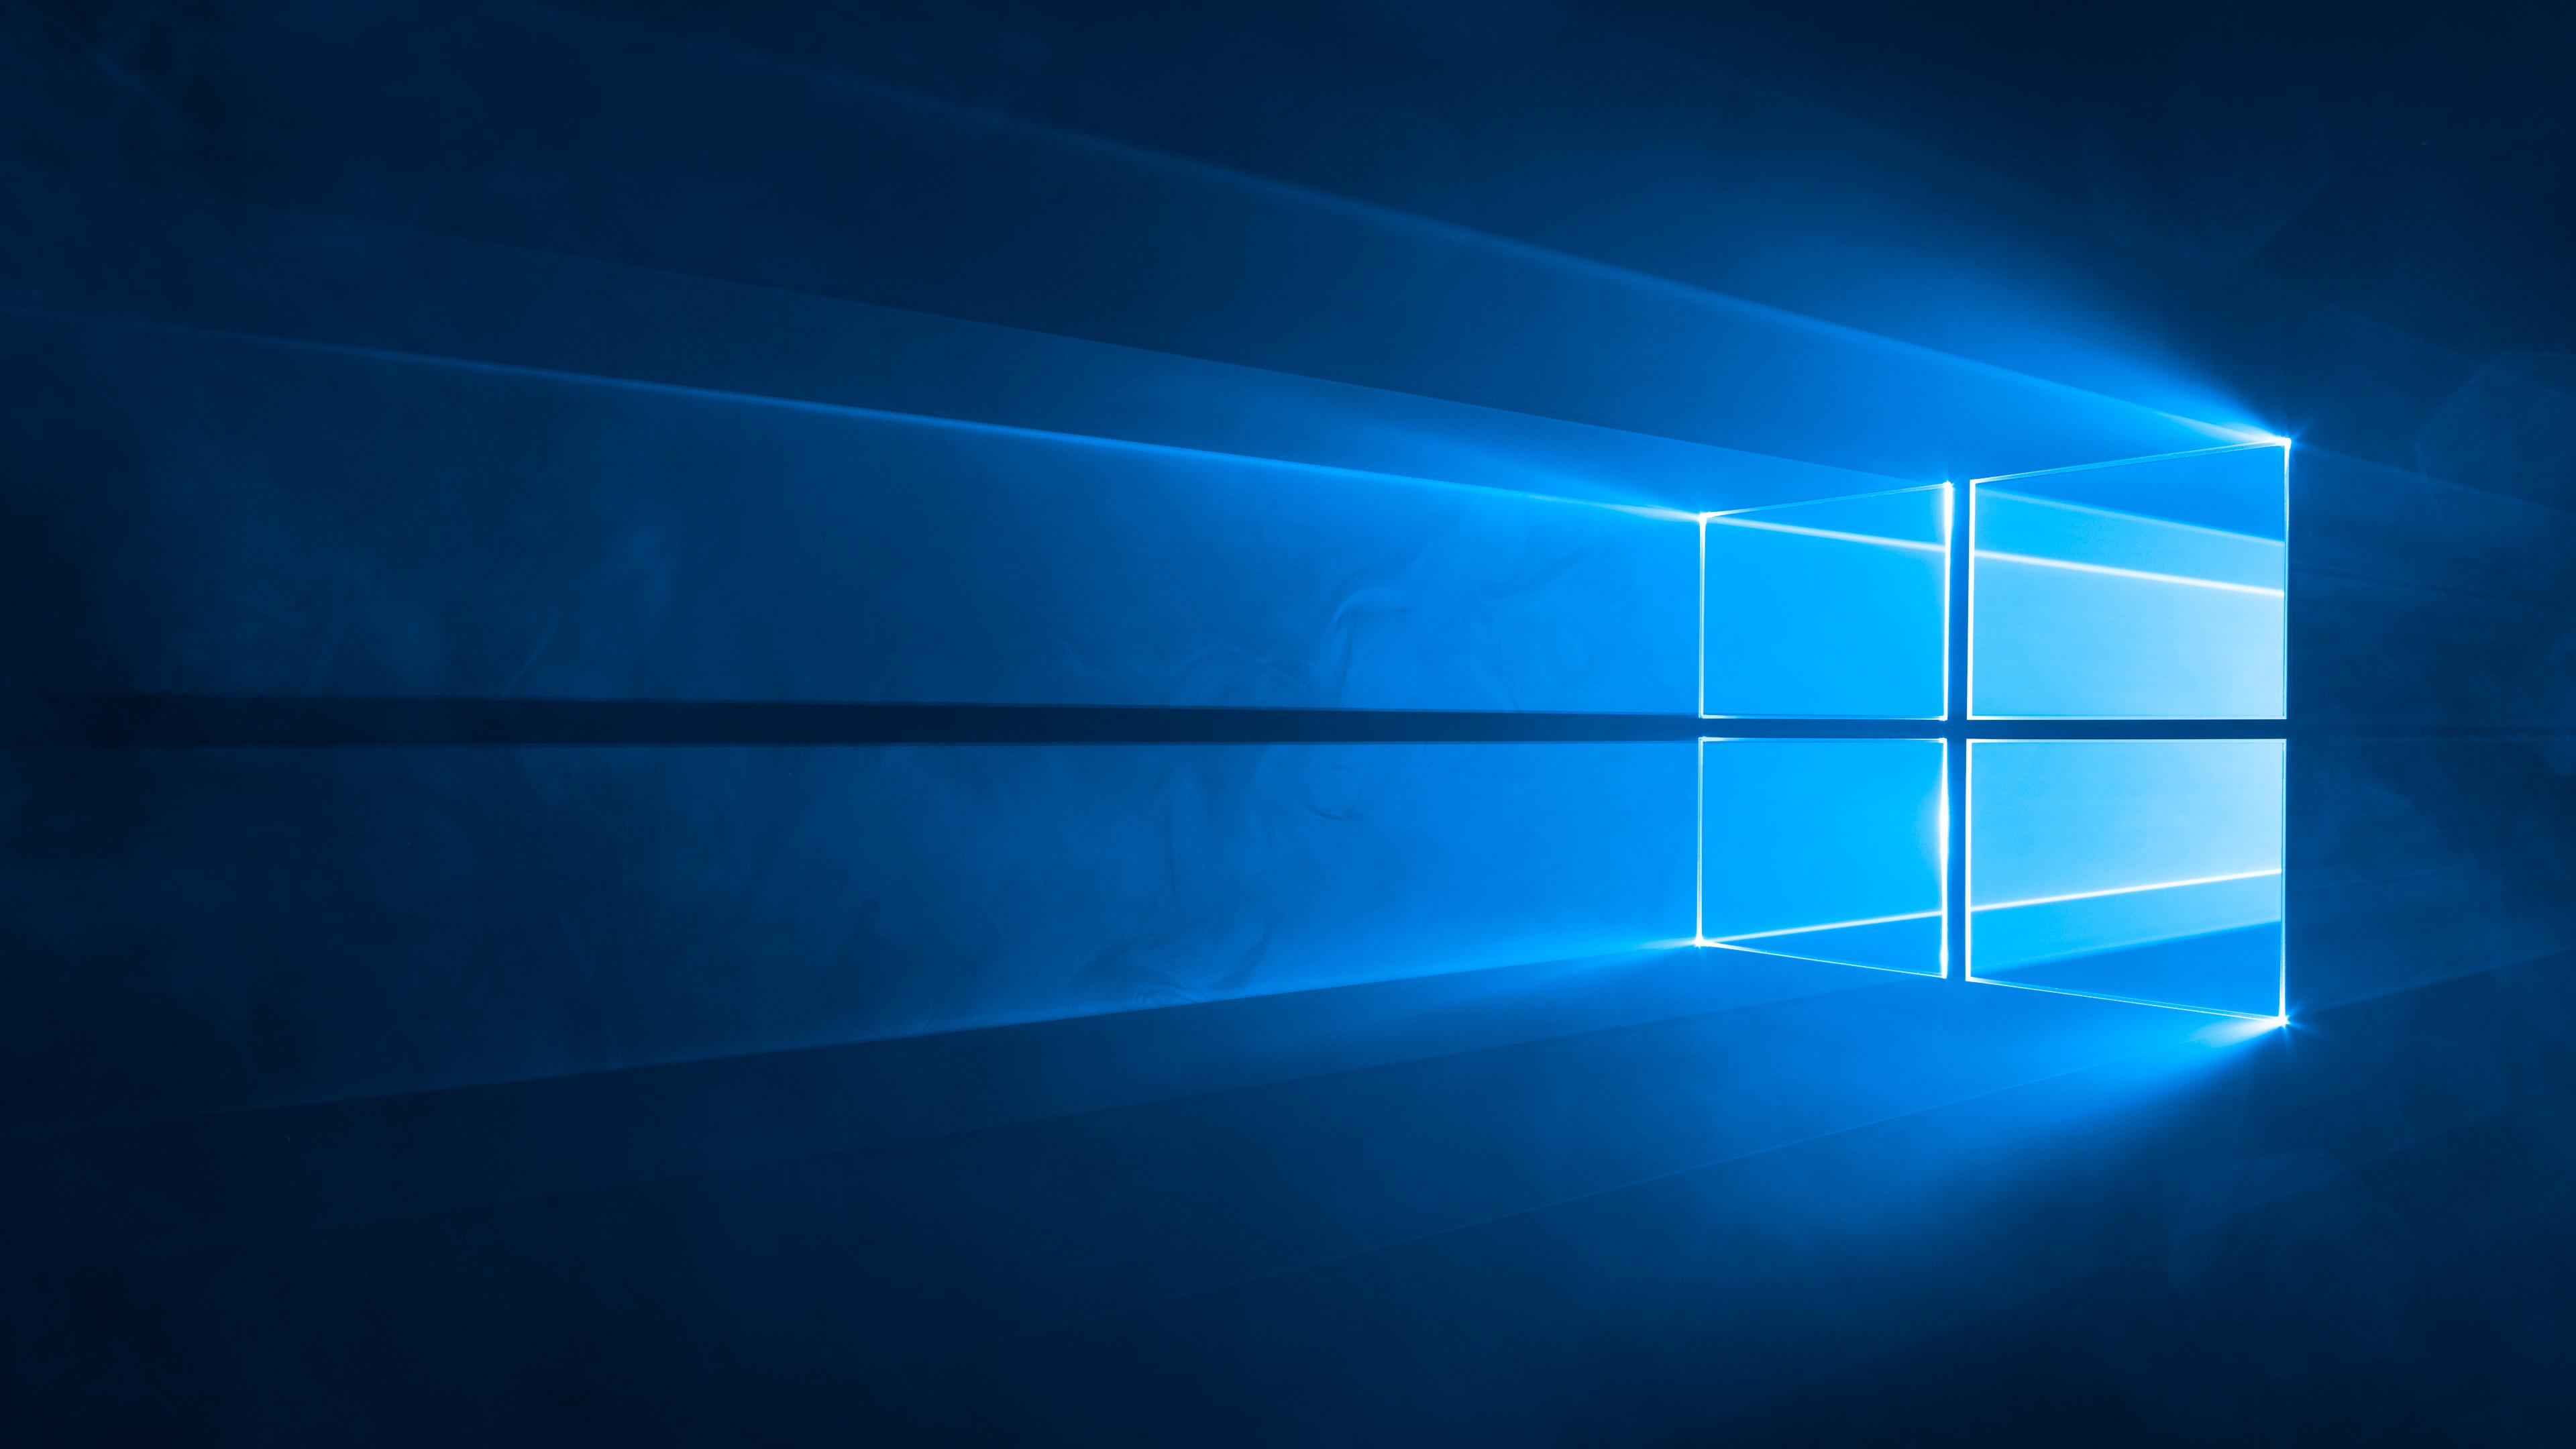 Windows-10-wallpapers-in-4K.jpg